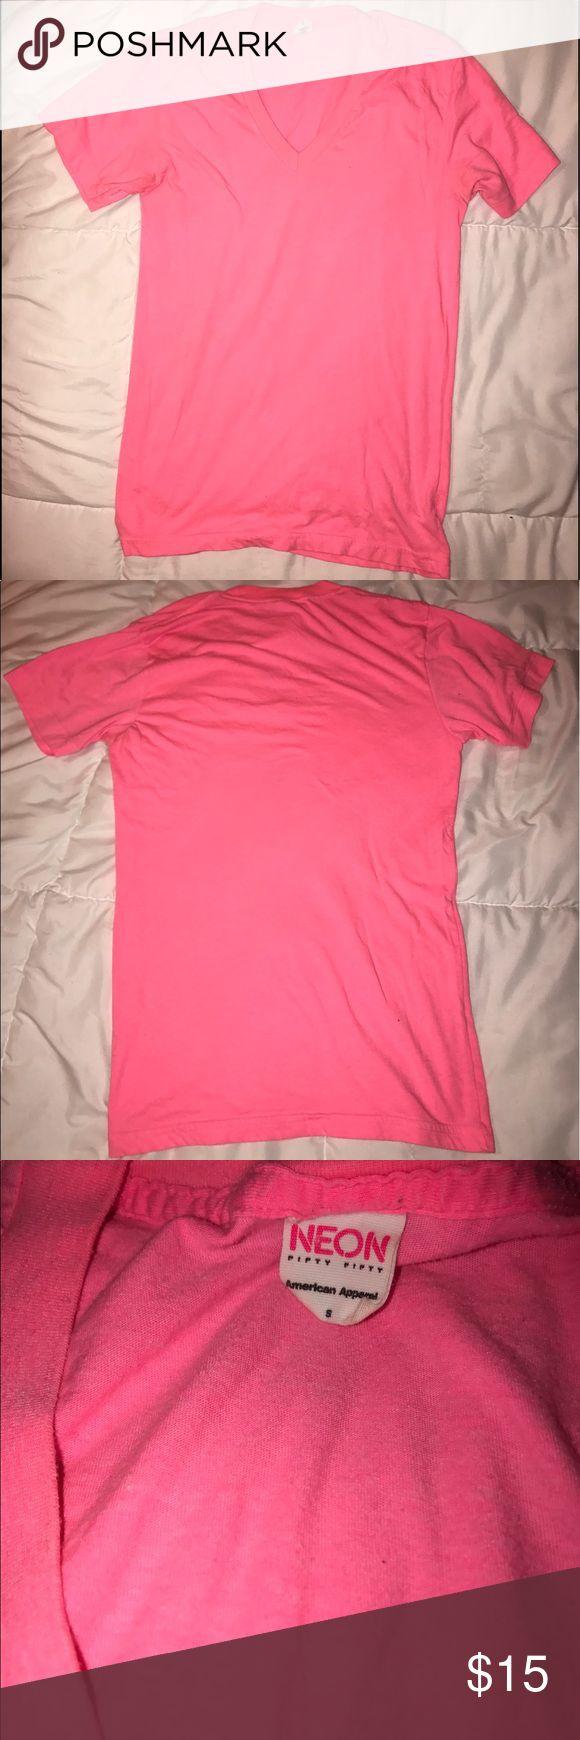 Selling this Classic Neon Pink American Apparel V Neck T-Shirt on Poshmark! My username is: anasun2011. #shopmycloset #poshmark #fashion #shopping #style #forsale #American Apparel #Tops